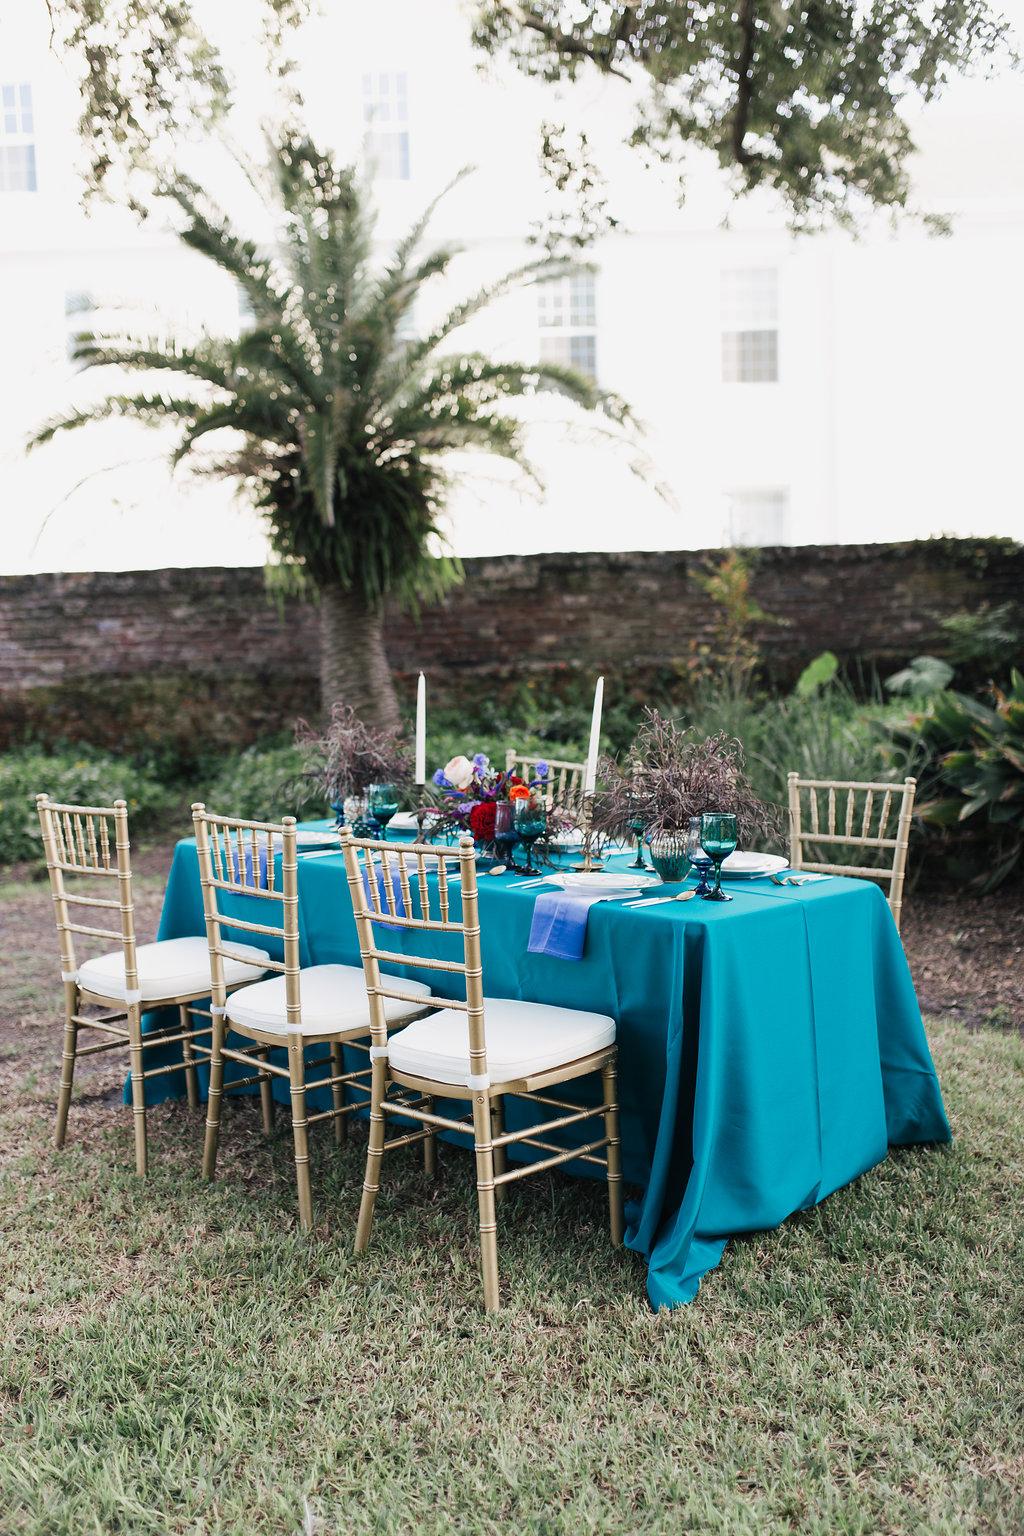 tropical inspired weddings - photo by Alondra Vega Photography http://ruffledblog.com/jewel-toned-wedding-ideas-with-a-surprise-proposal